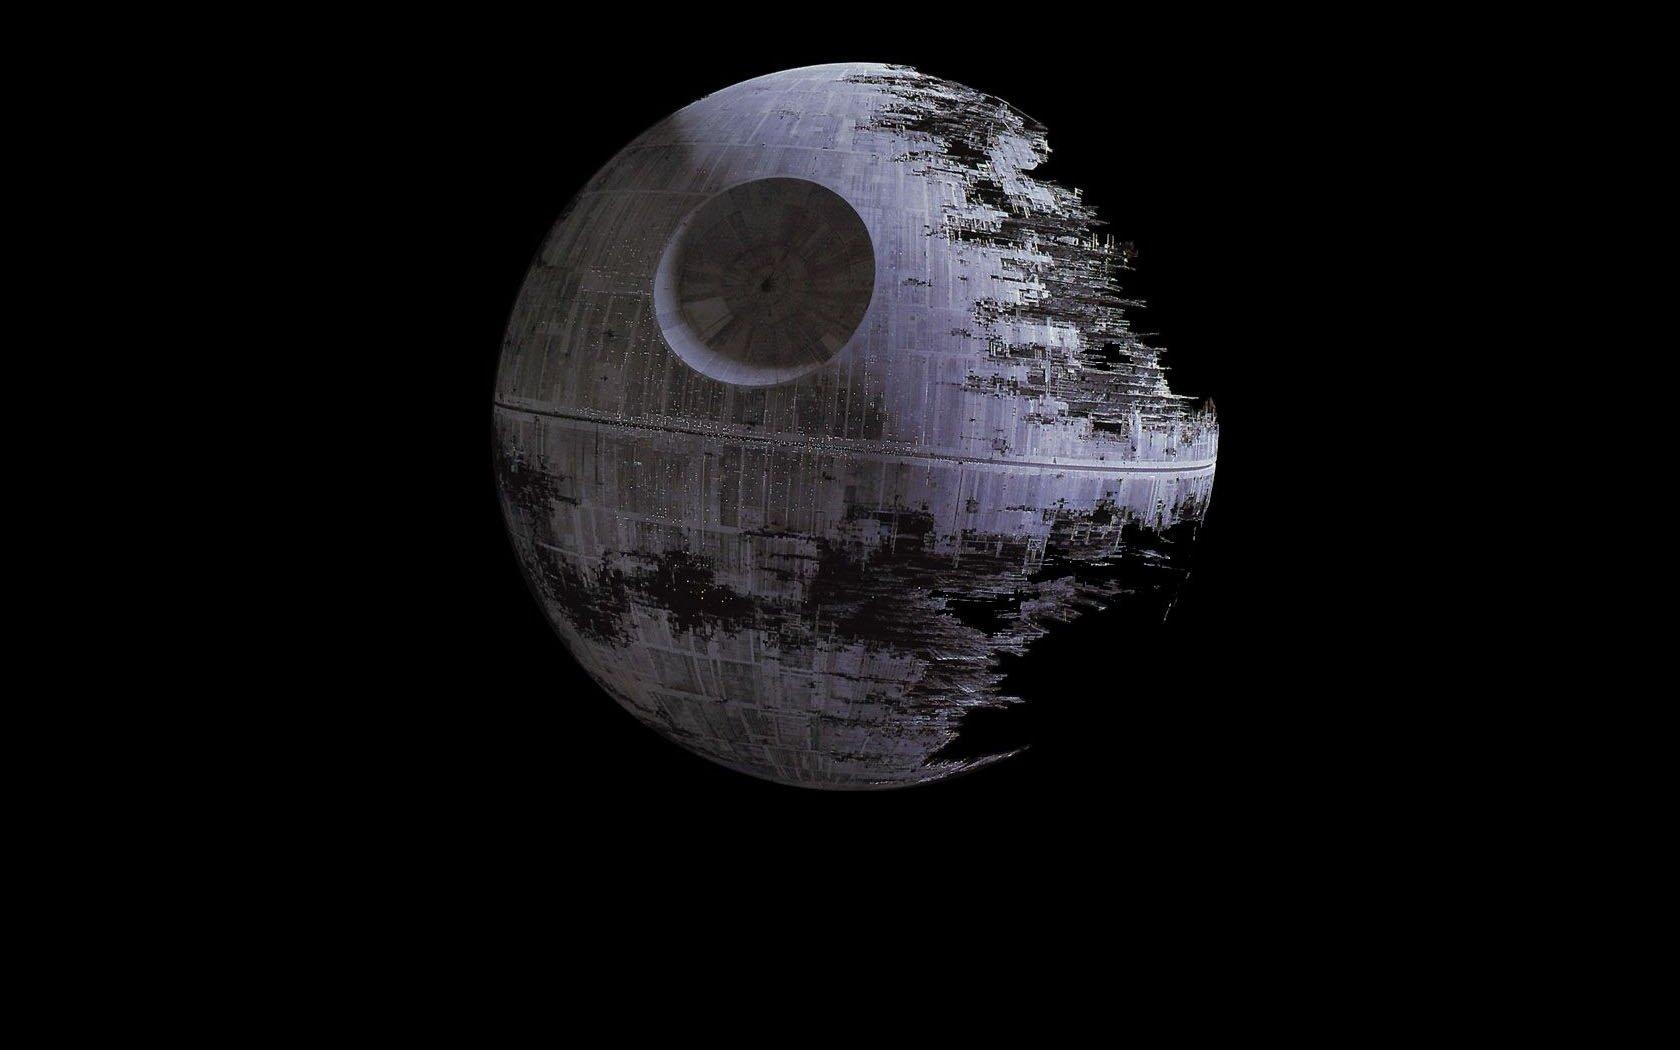 Star Wars Death Star Wallpaper 1680x1050 285858 Wallpaperup